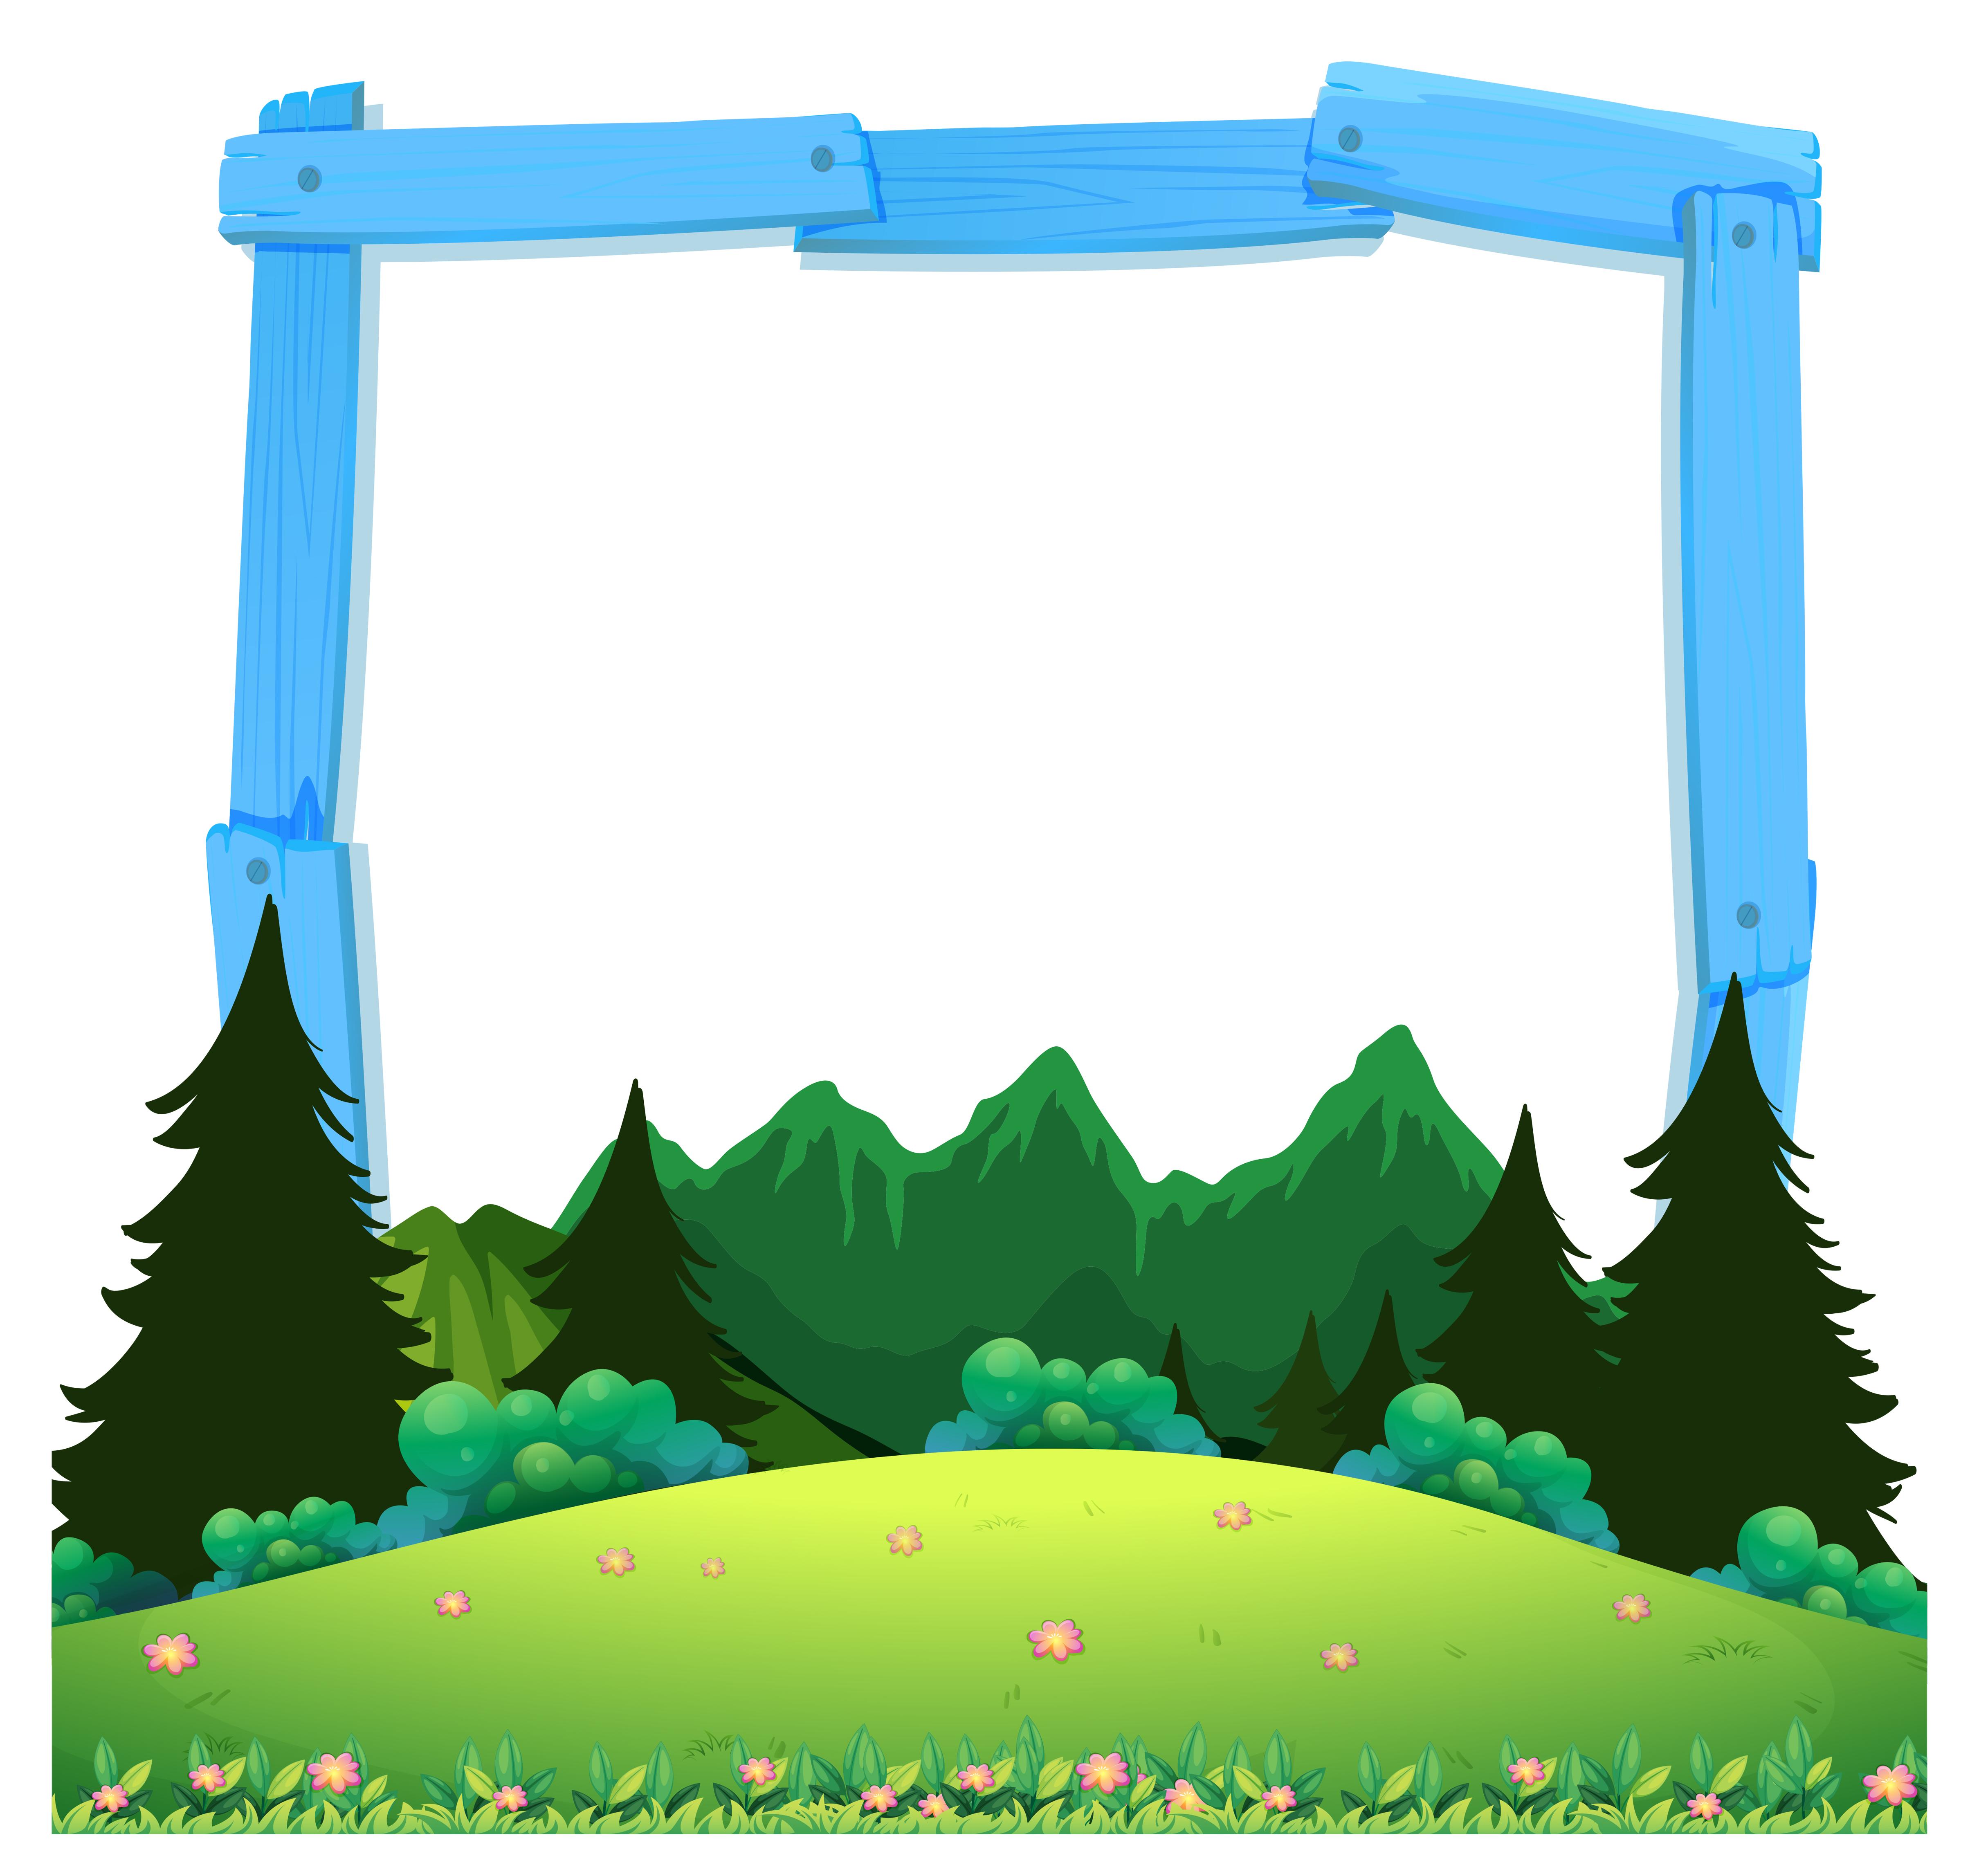 a wooden nature frame download free vectors clipart graphics vector art vecteezy